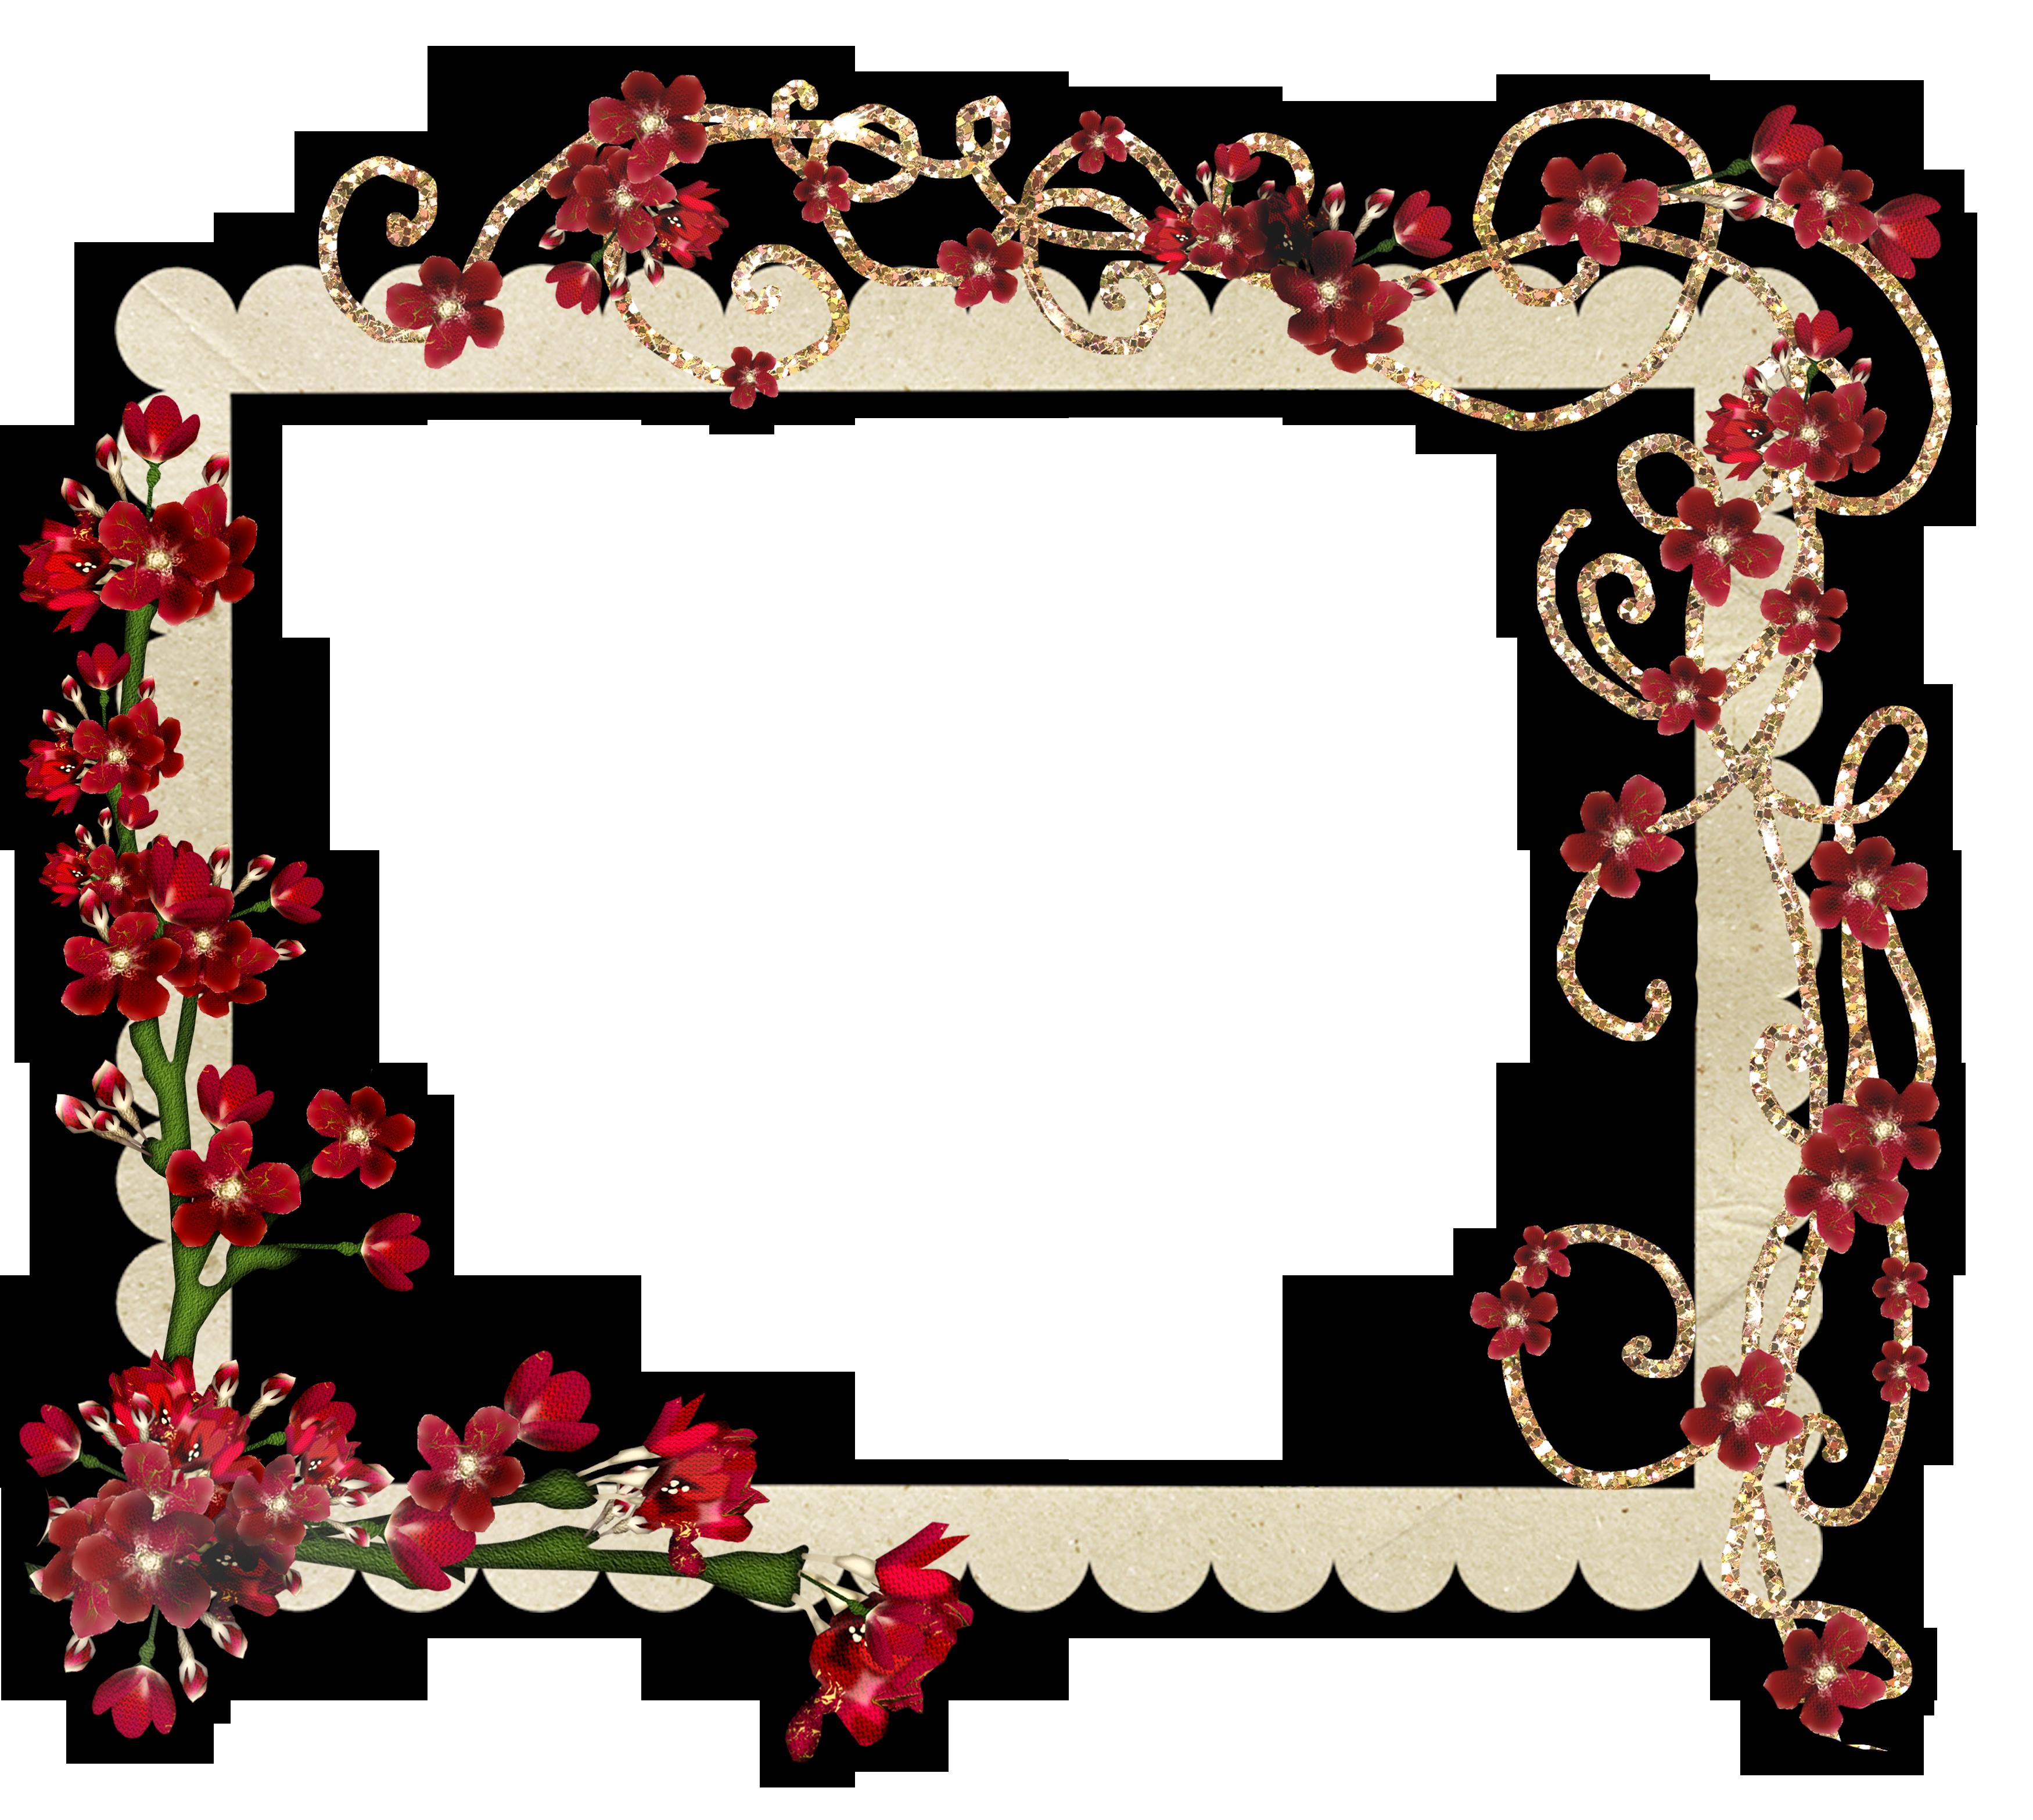 Картинки рамки красивые на прозрачном фоне, простым карандашом